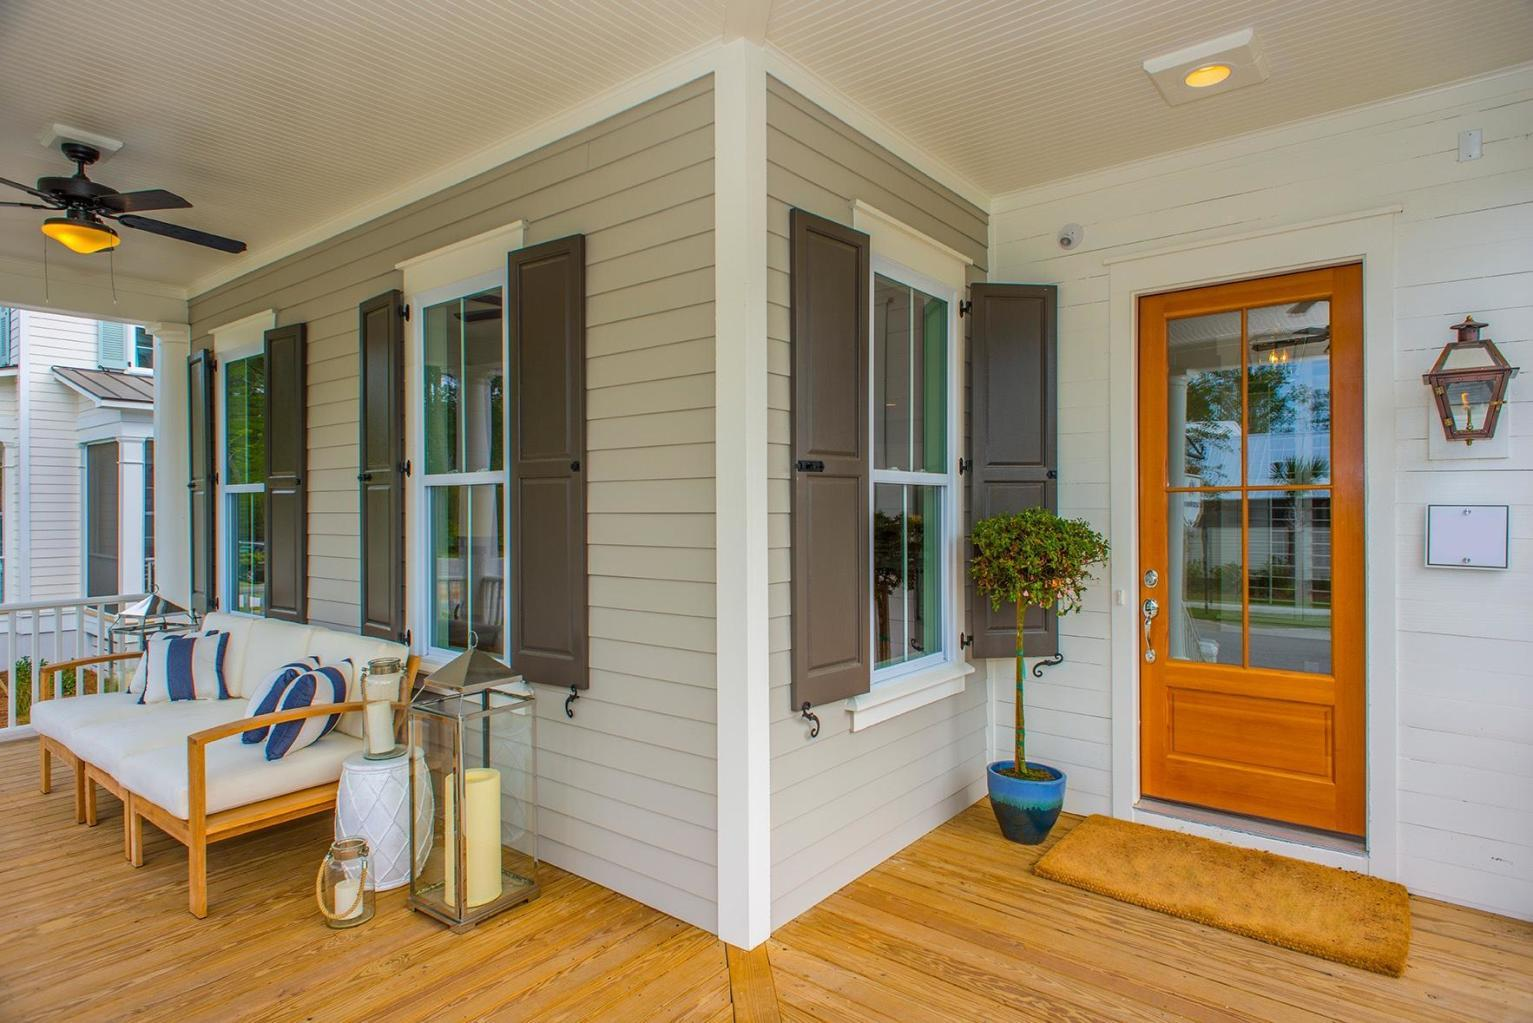 Carolina Park Homes For Sale - 1534 Banning, Mount Pleasant, SC - 23